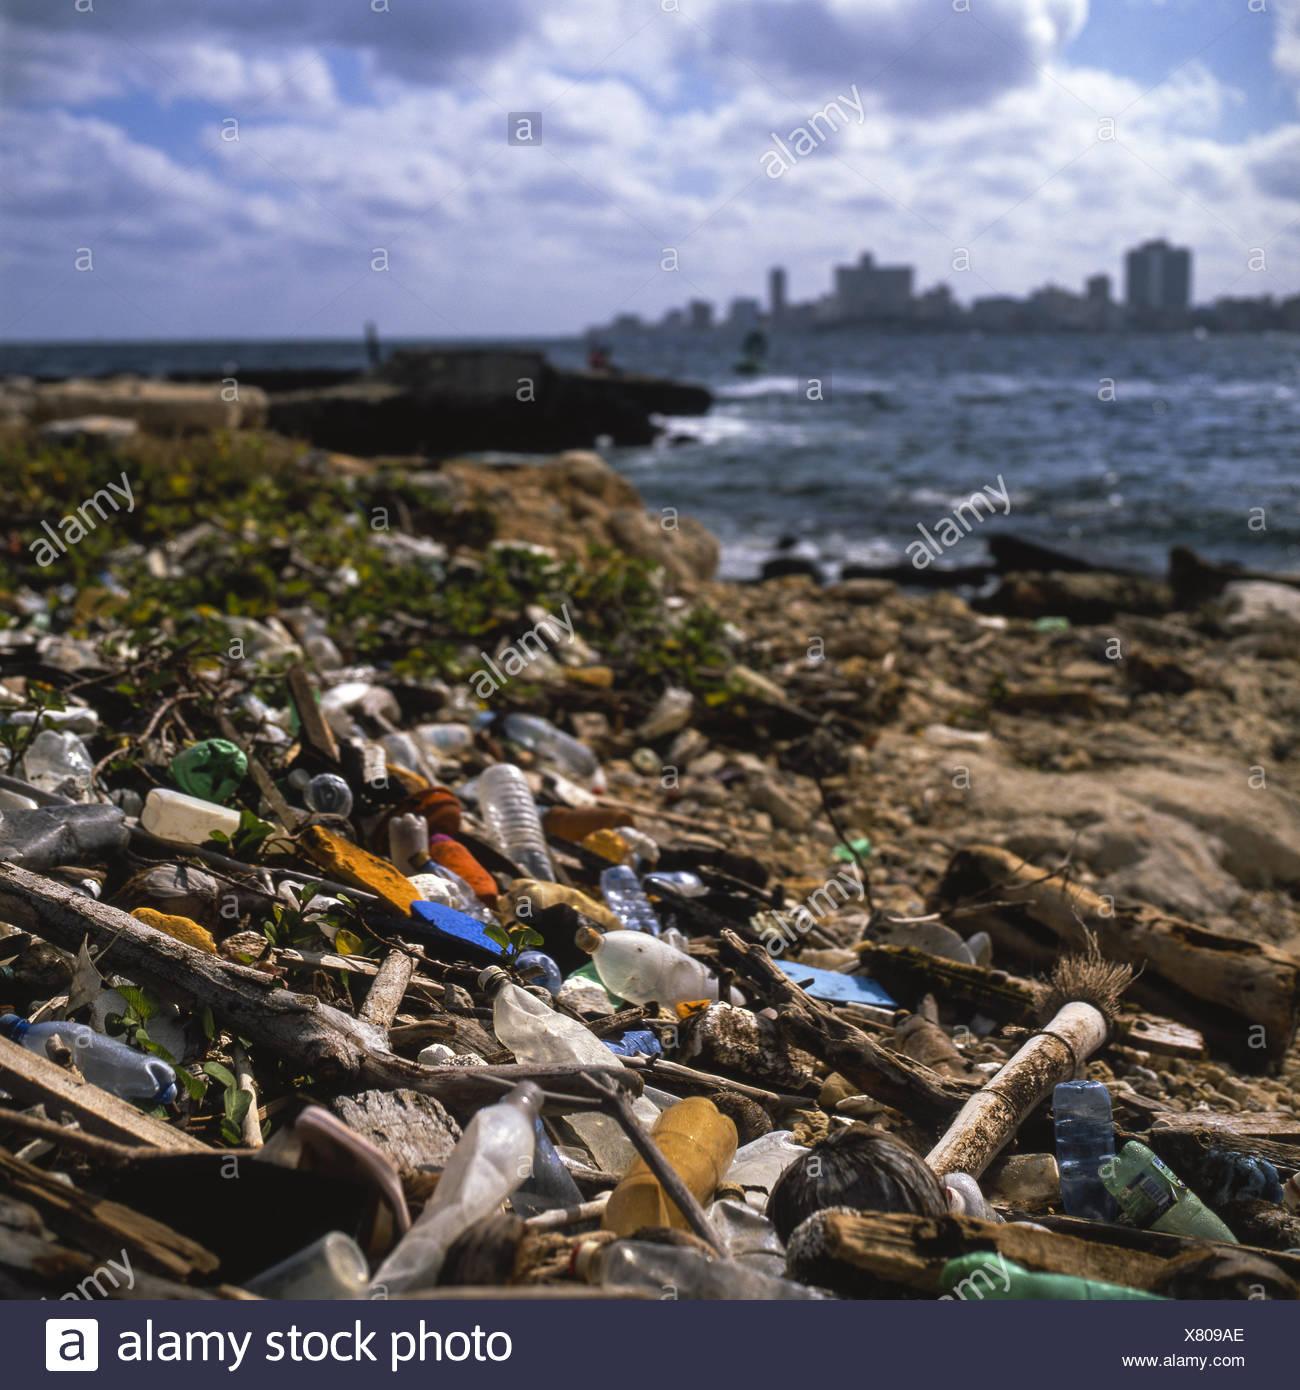 Choking on domestic waste Stock Photo